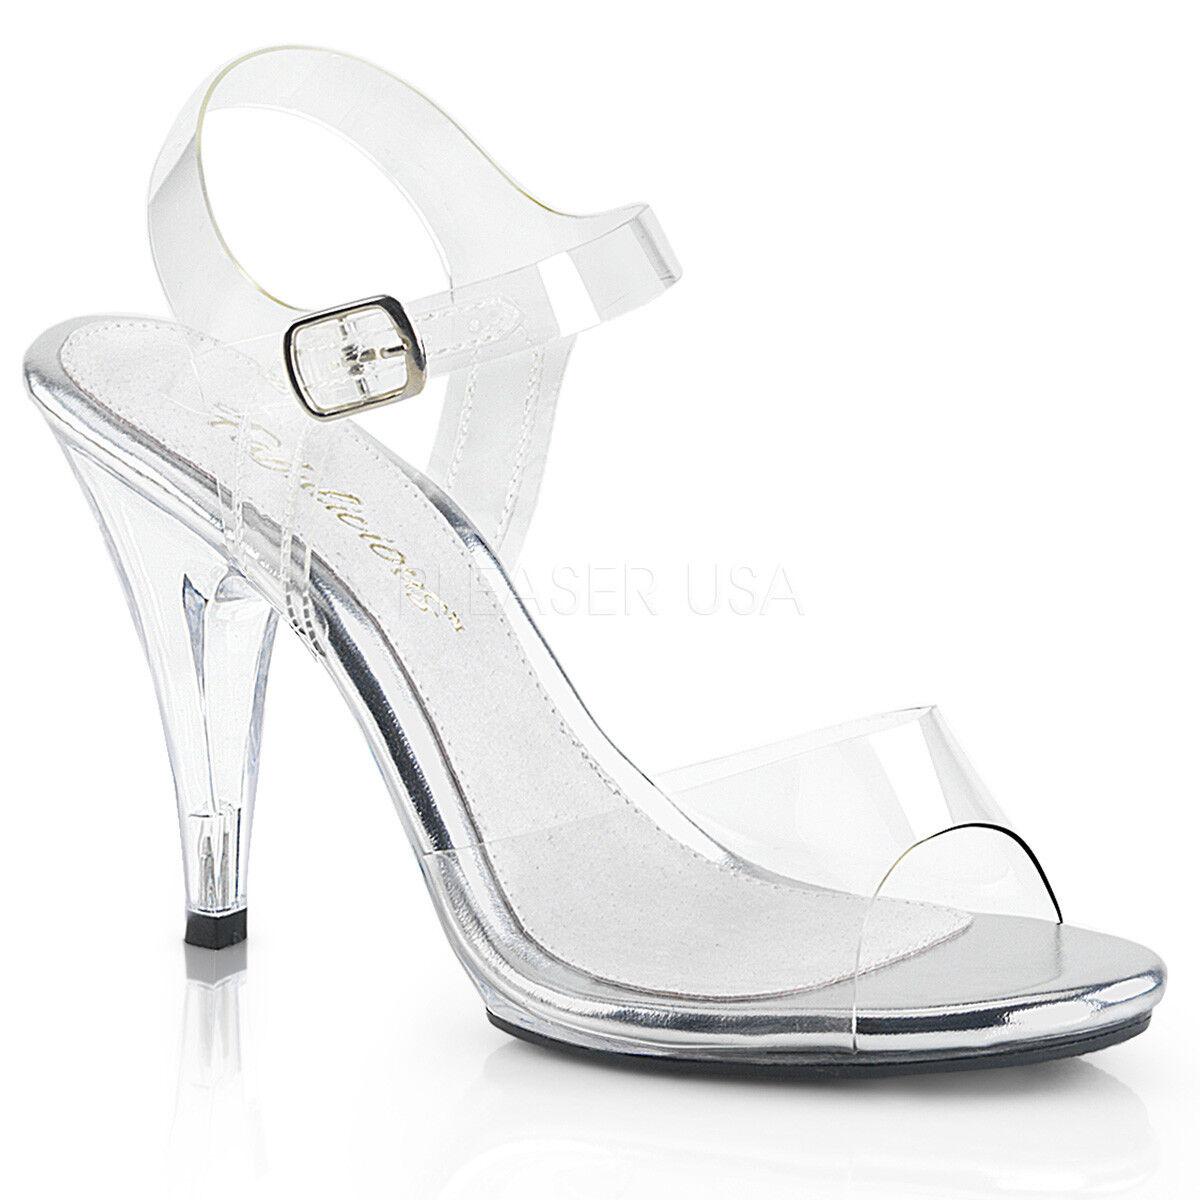 PLEASER FABULICIOUS FABULICIOUS PLEASER CARESS-408 CLEAR BIKINI COMPETITION SANDALS Schuhe 667916